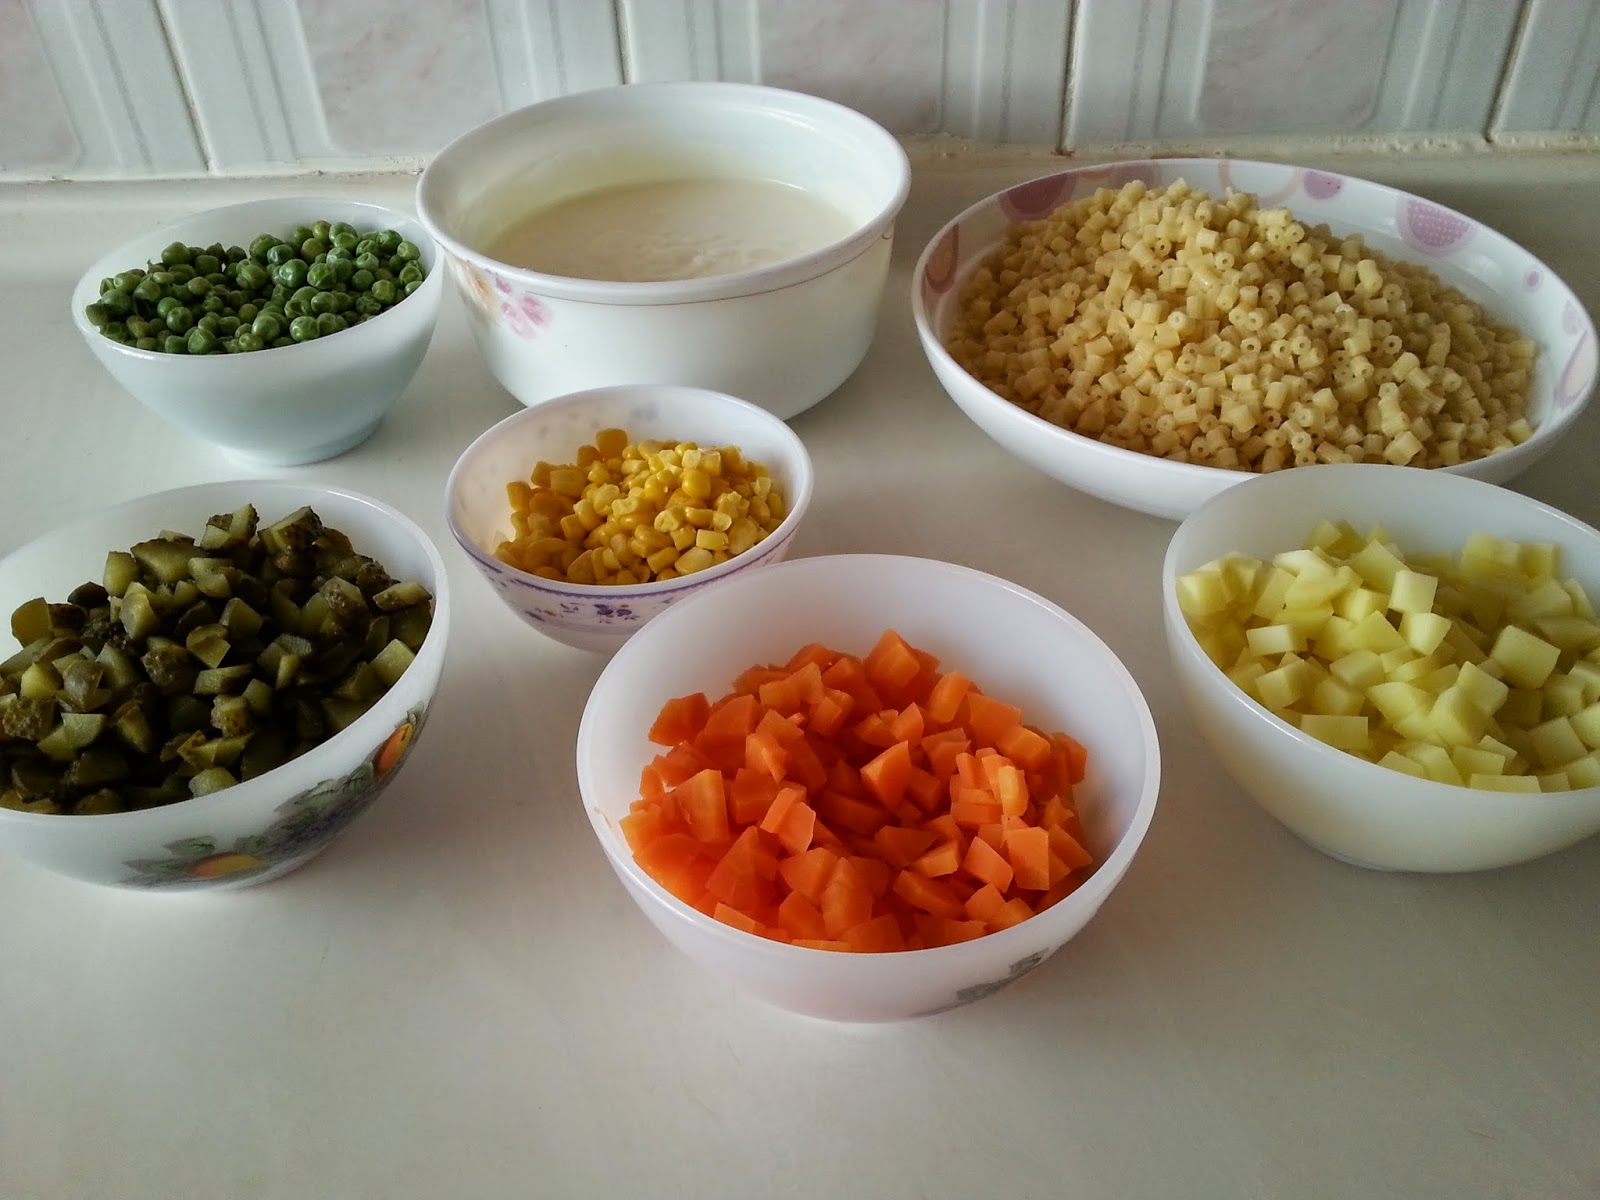 rus salata,salata,makarna,makarnalı rus salata